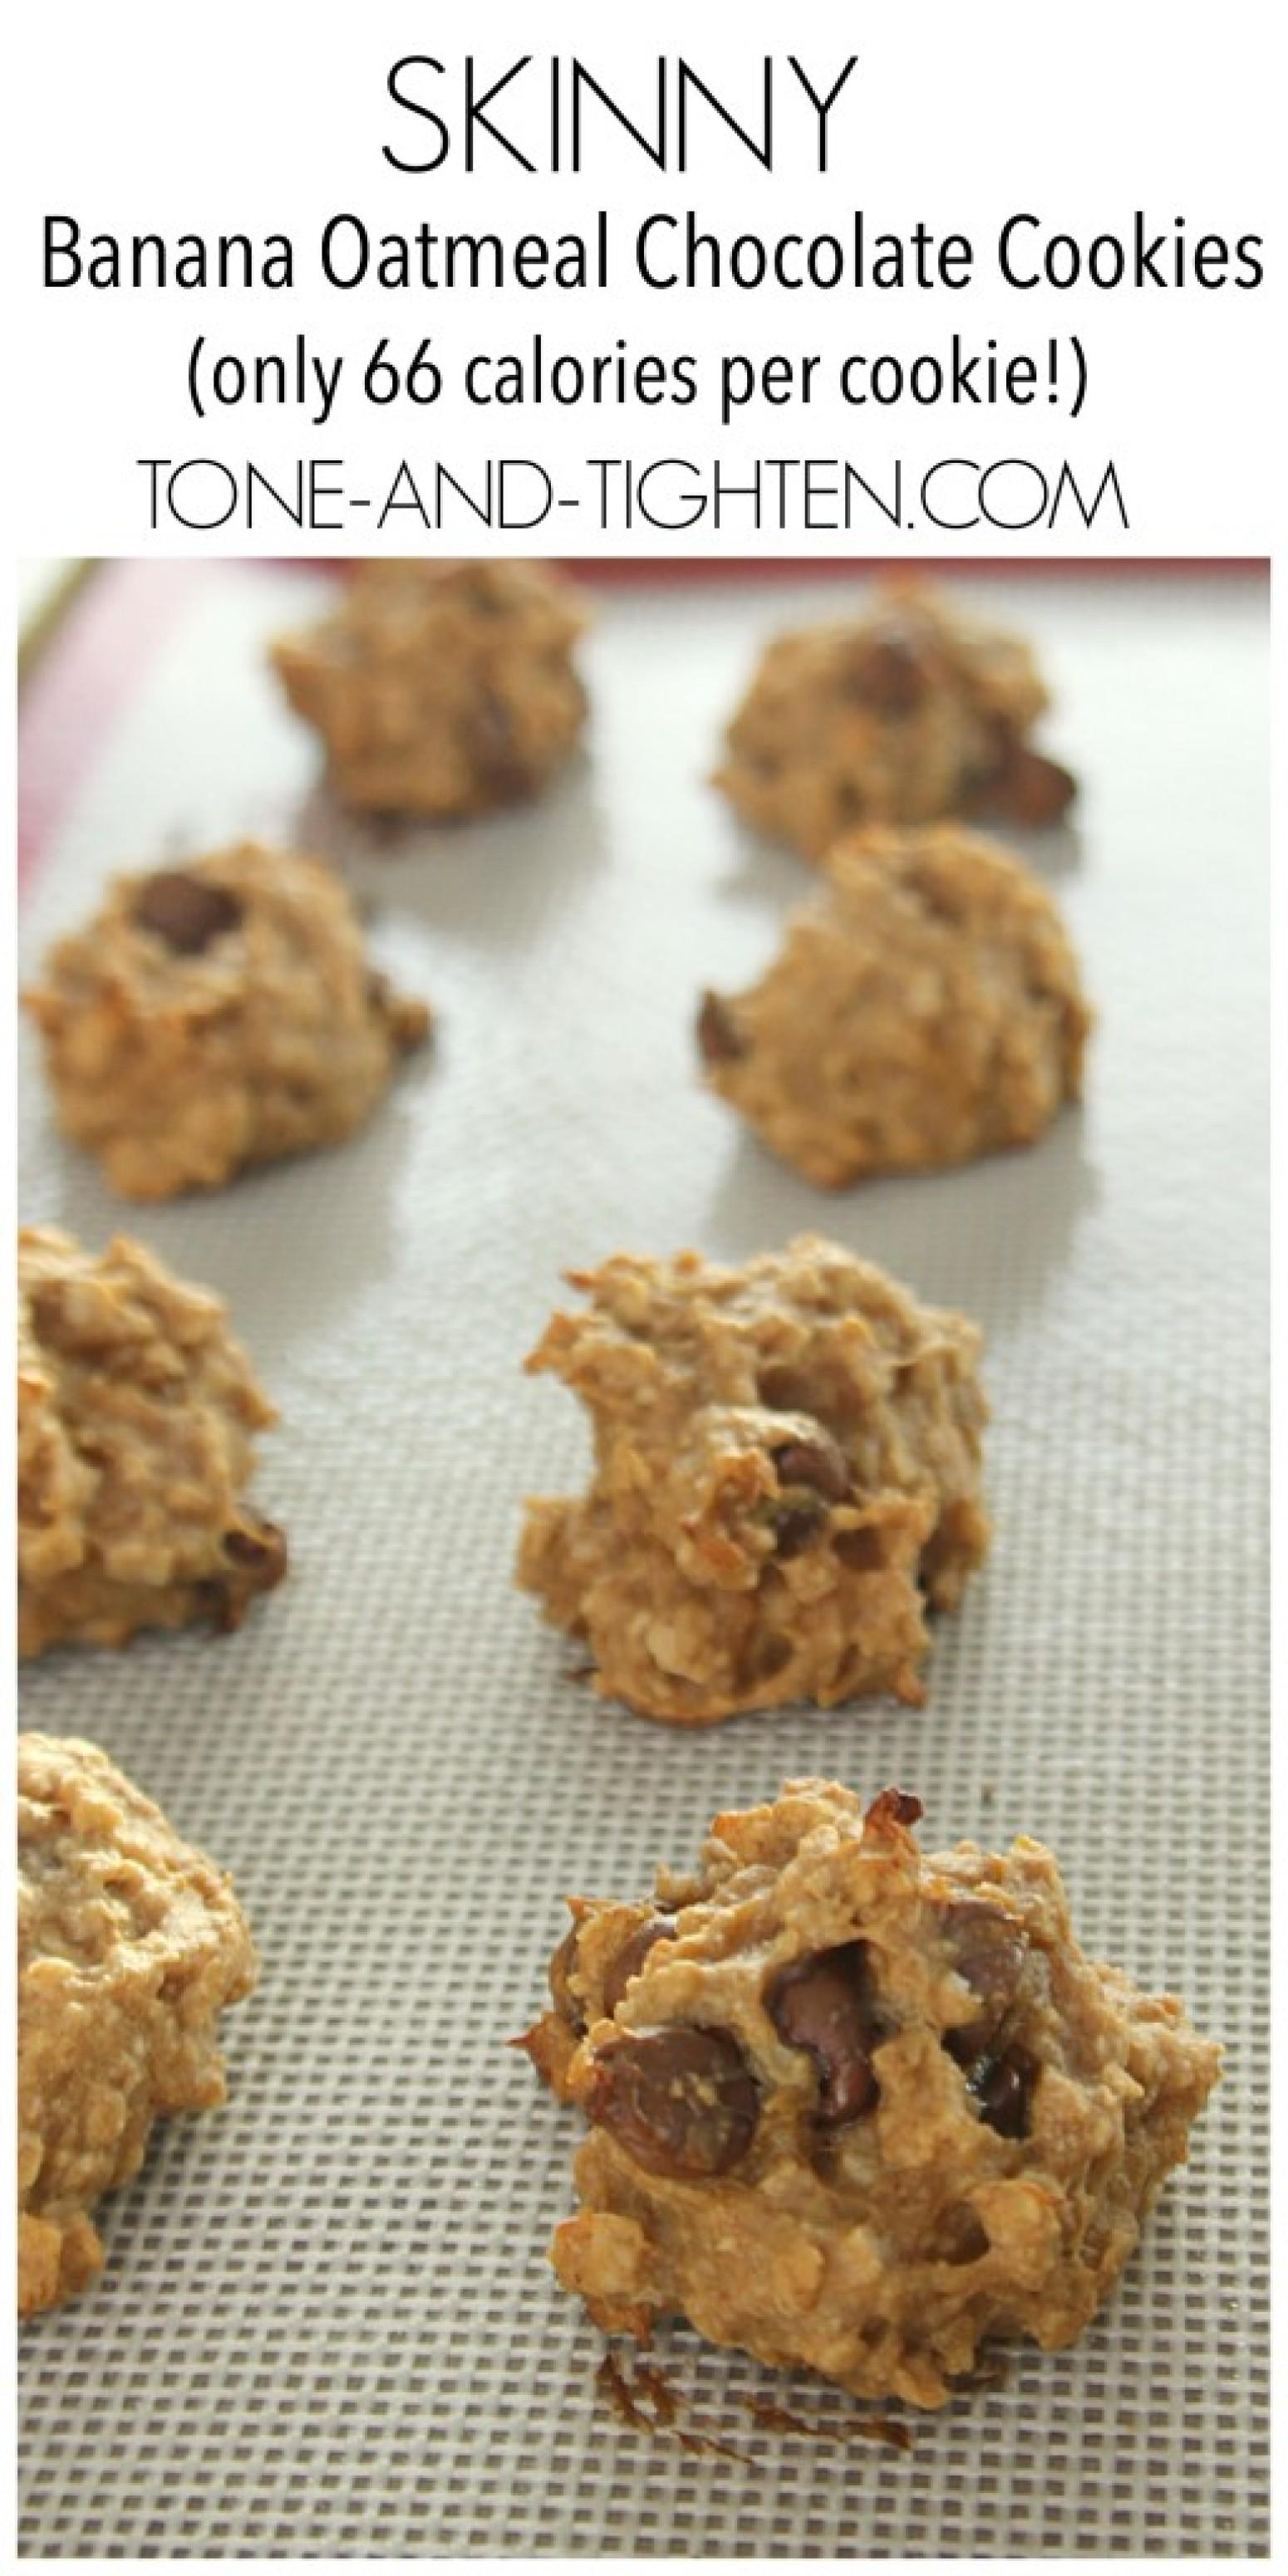 Skinny Banana Oatmeal Chocolate Cookies Recipe | Just A ...